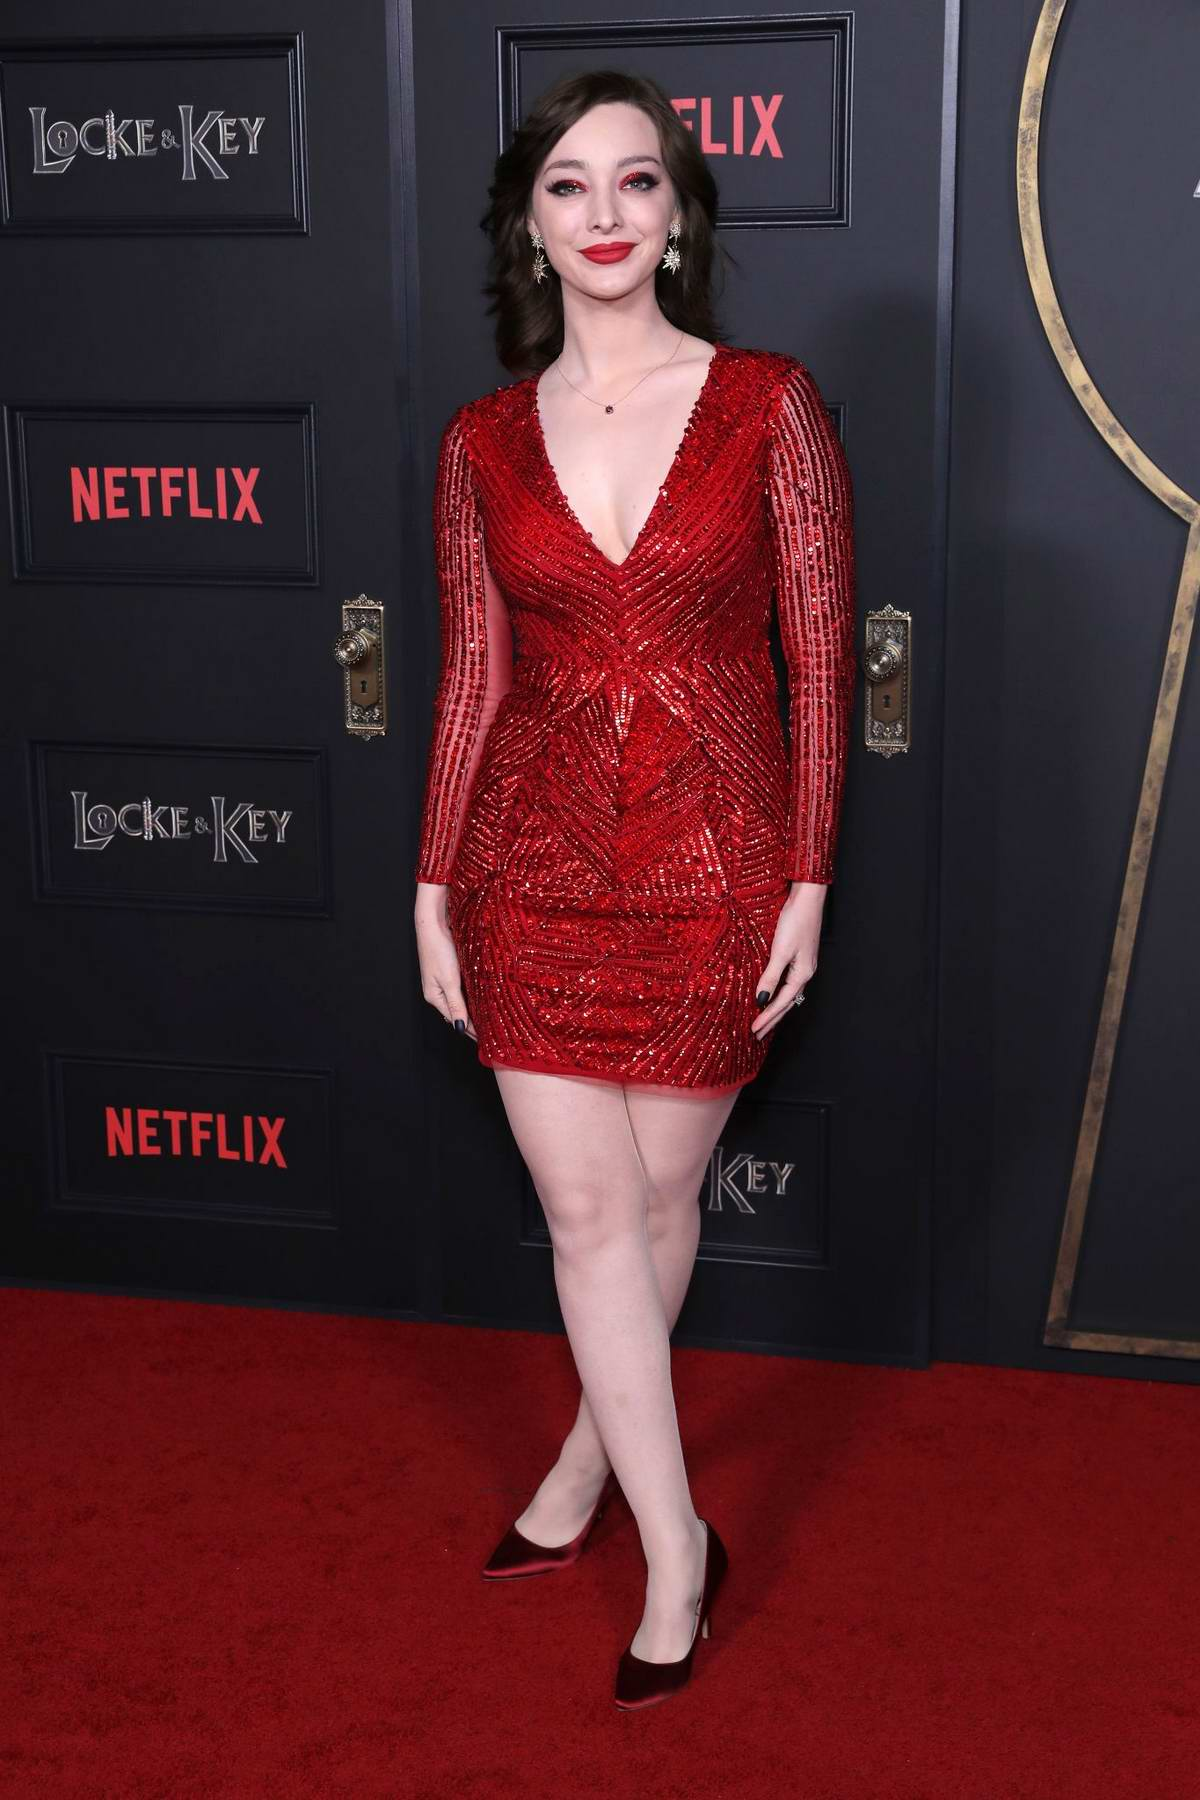 Emma Dumont attends Netflix's 'Locke & Key' Series Premiere in Hollywood, California